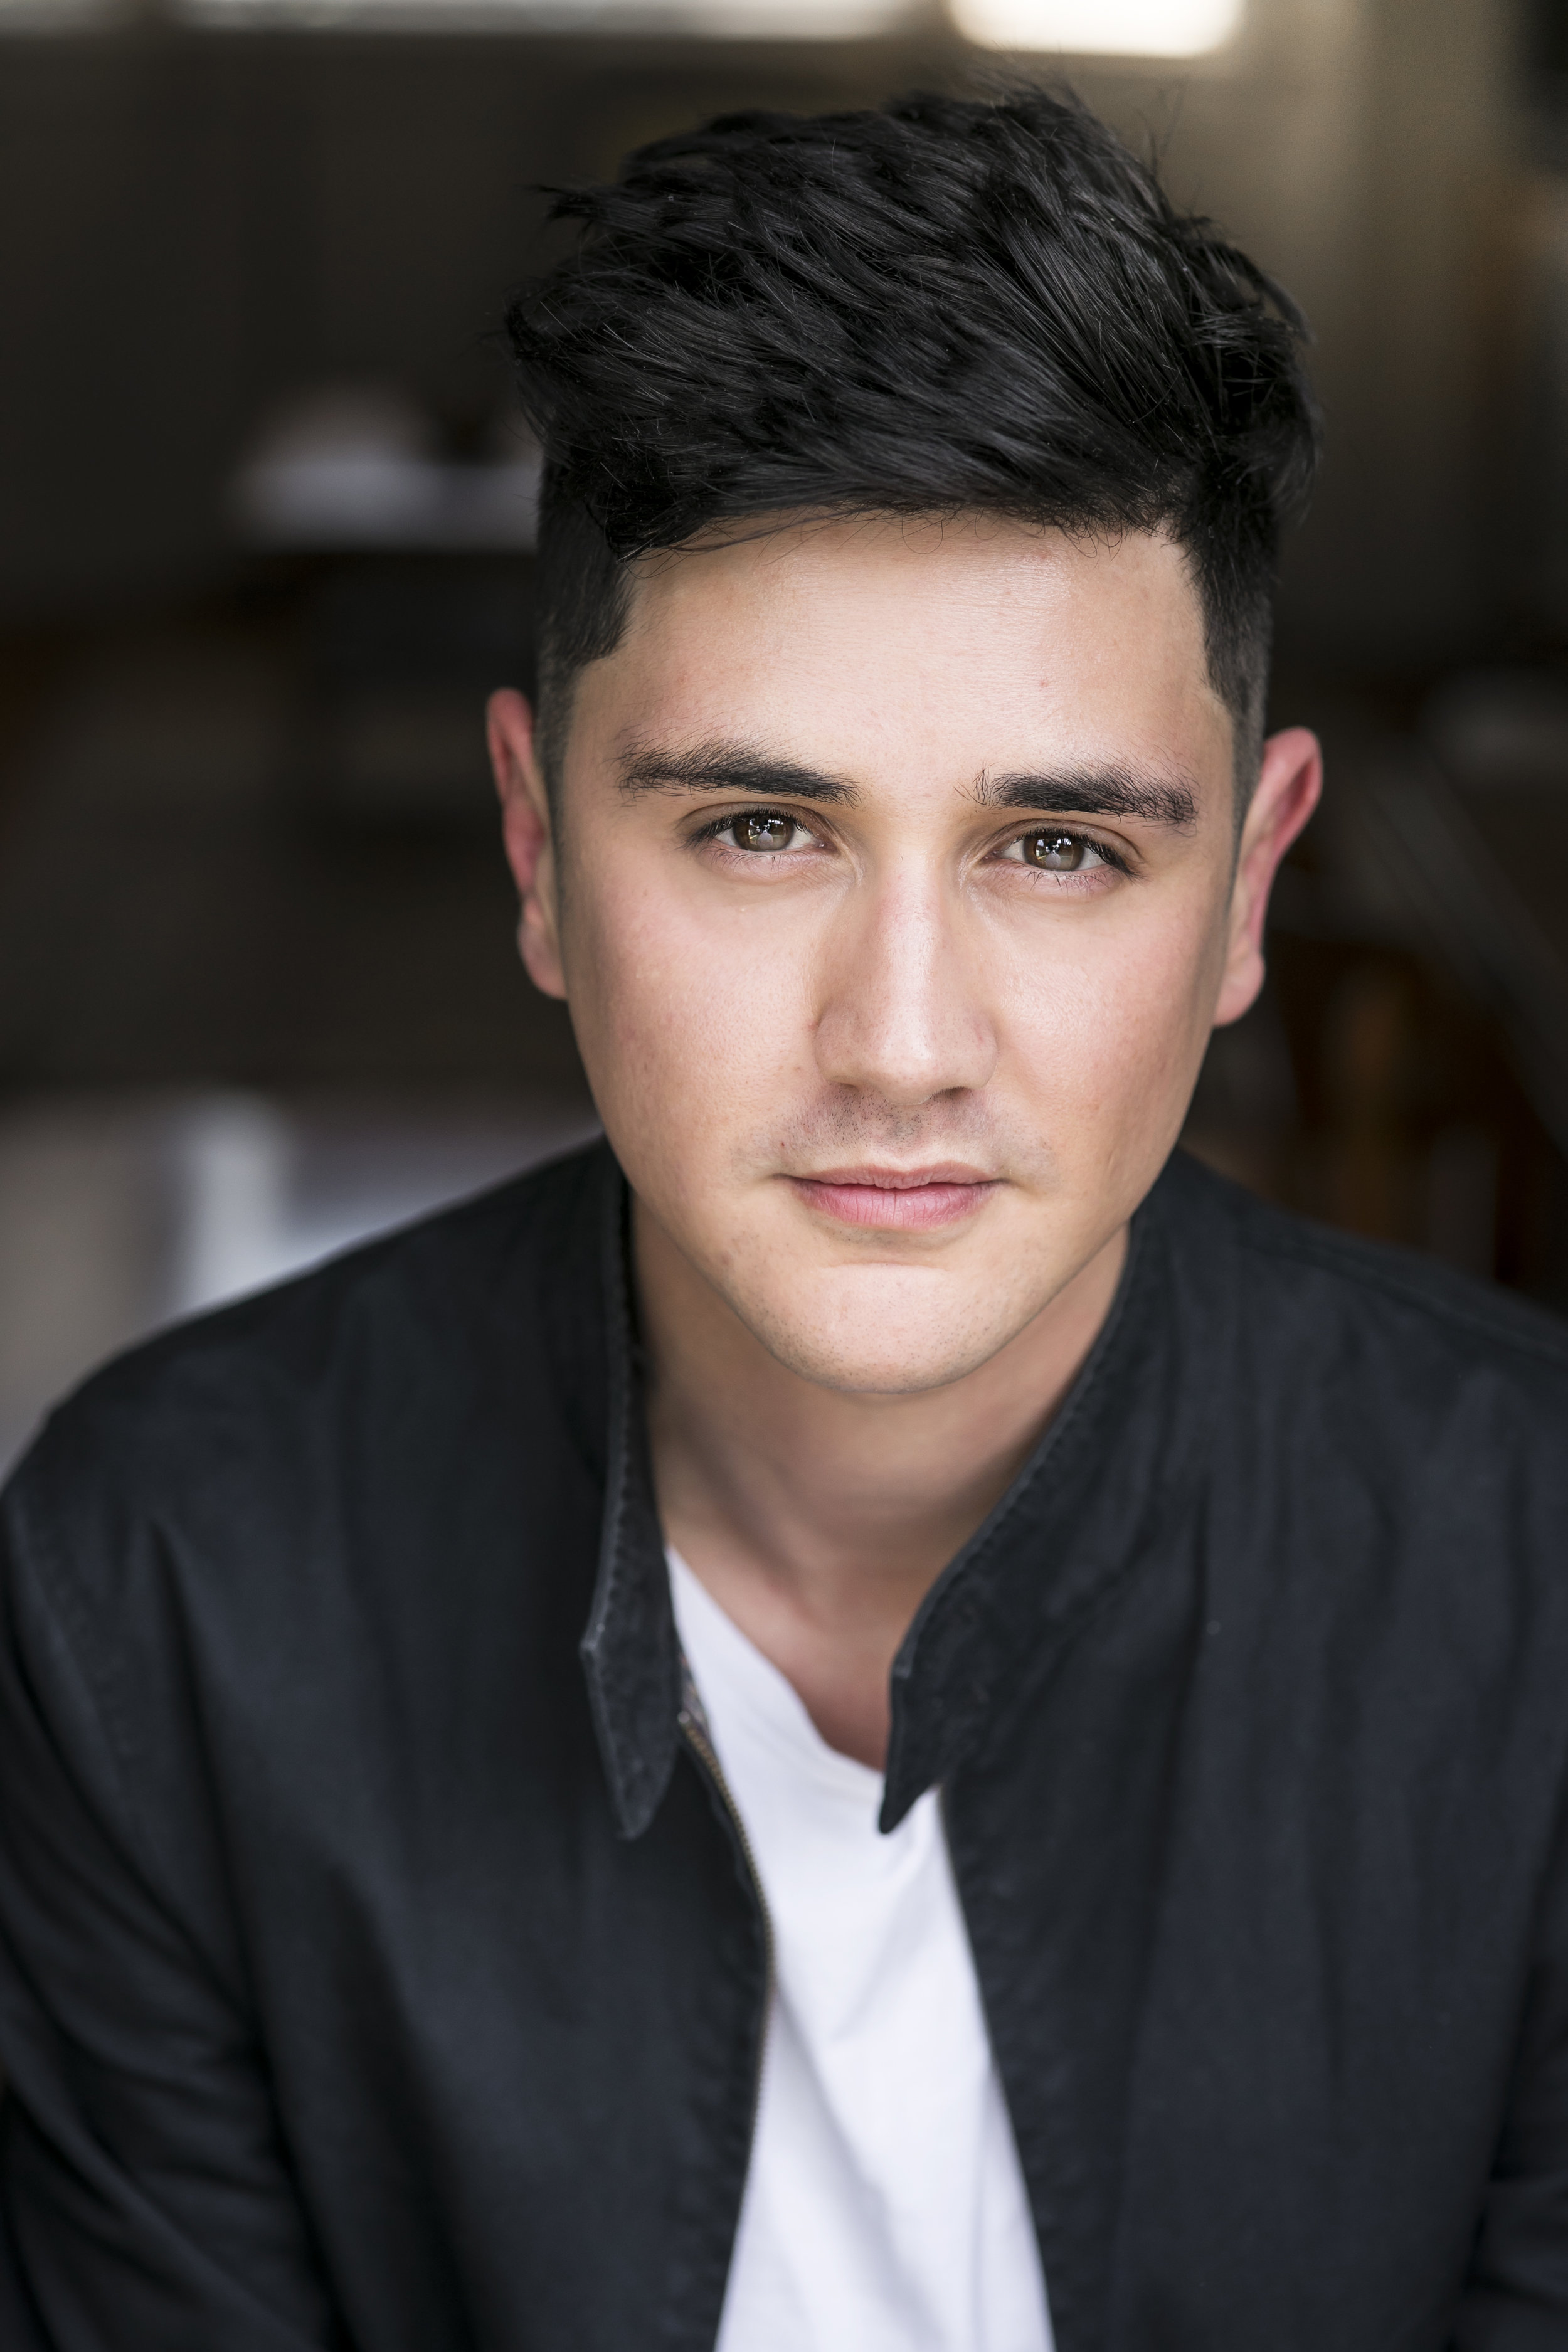 <B>Nathan Mudge</b>